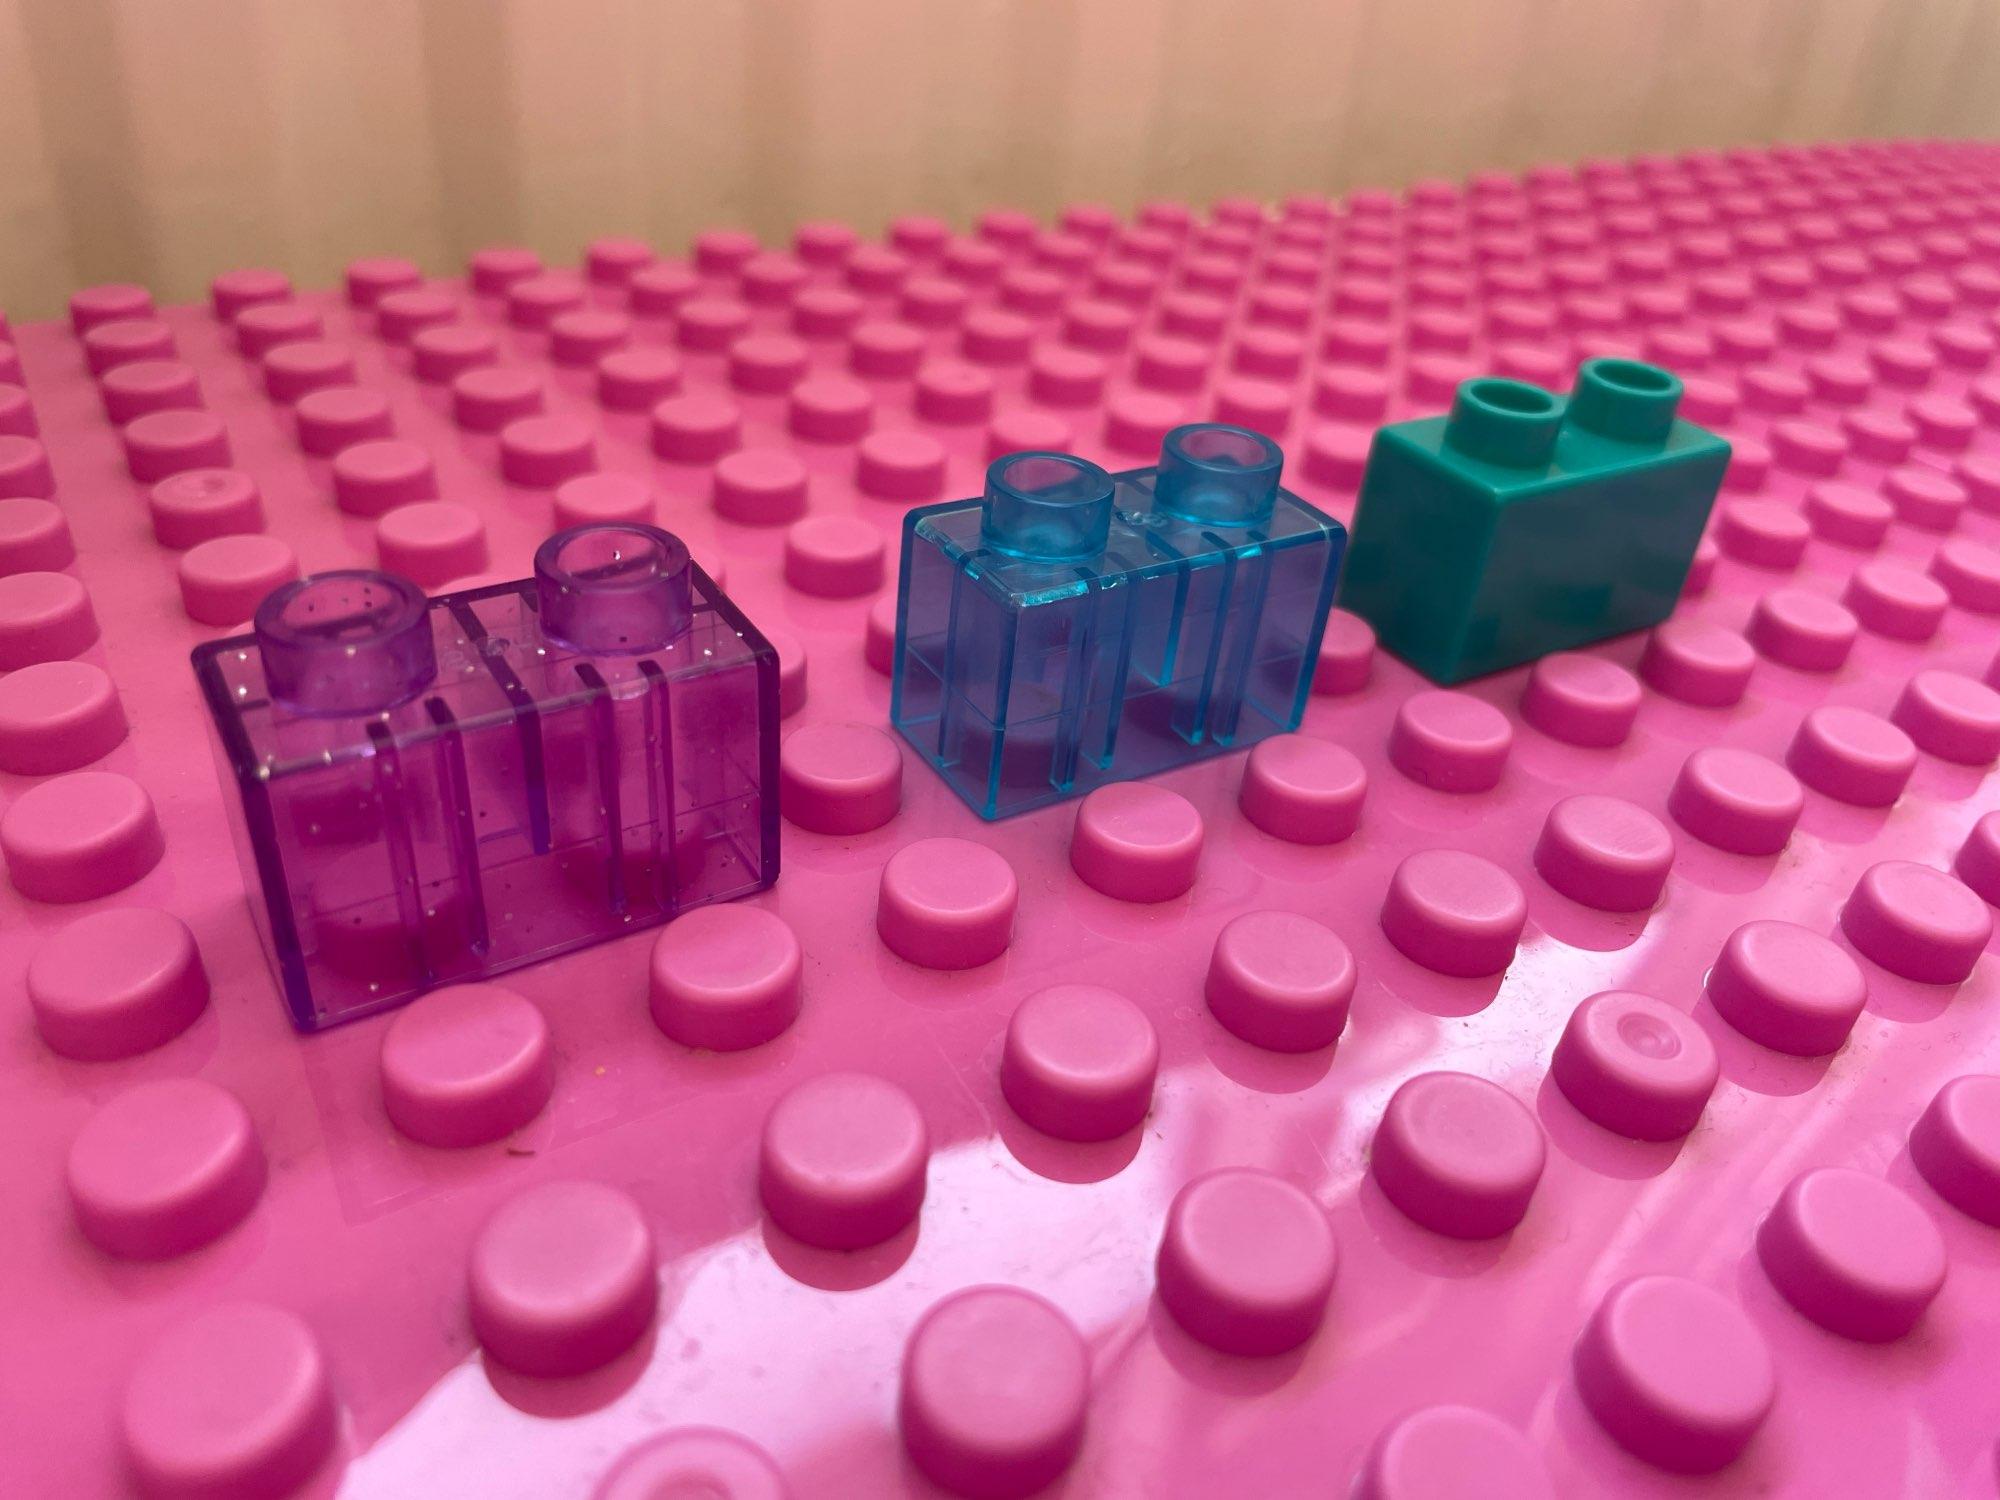 10Pcs MOC DIY Large Building Blocks Compatible Duplo Transparent Big Bricks Children Kid Assembly Educational Creative Toy Gifts photo review